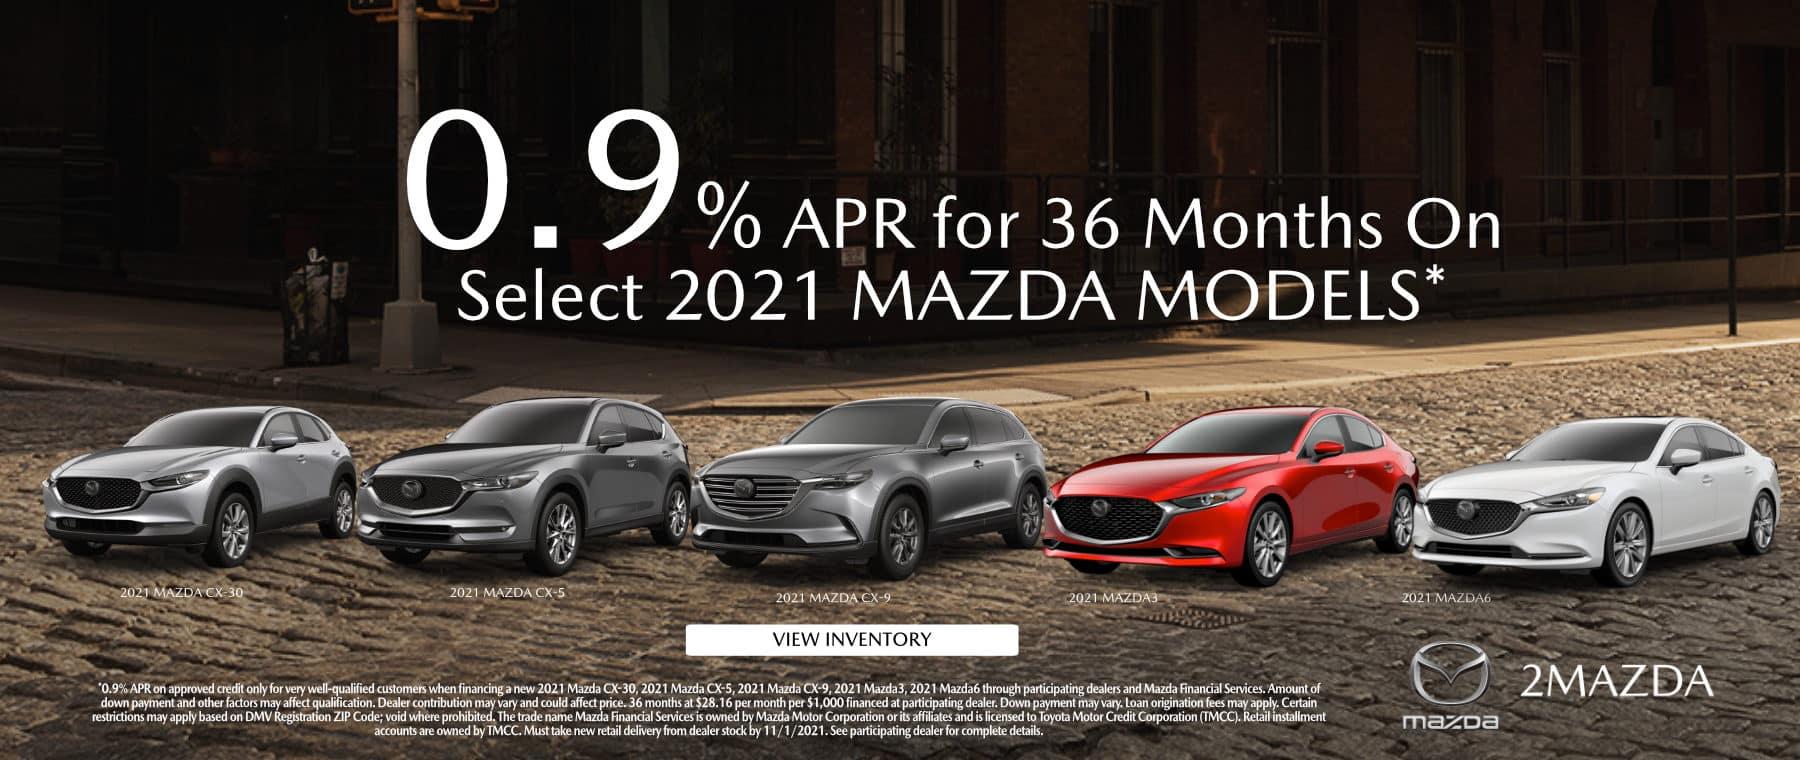 R_October_2021 General Mazda